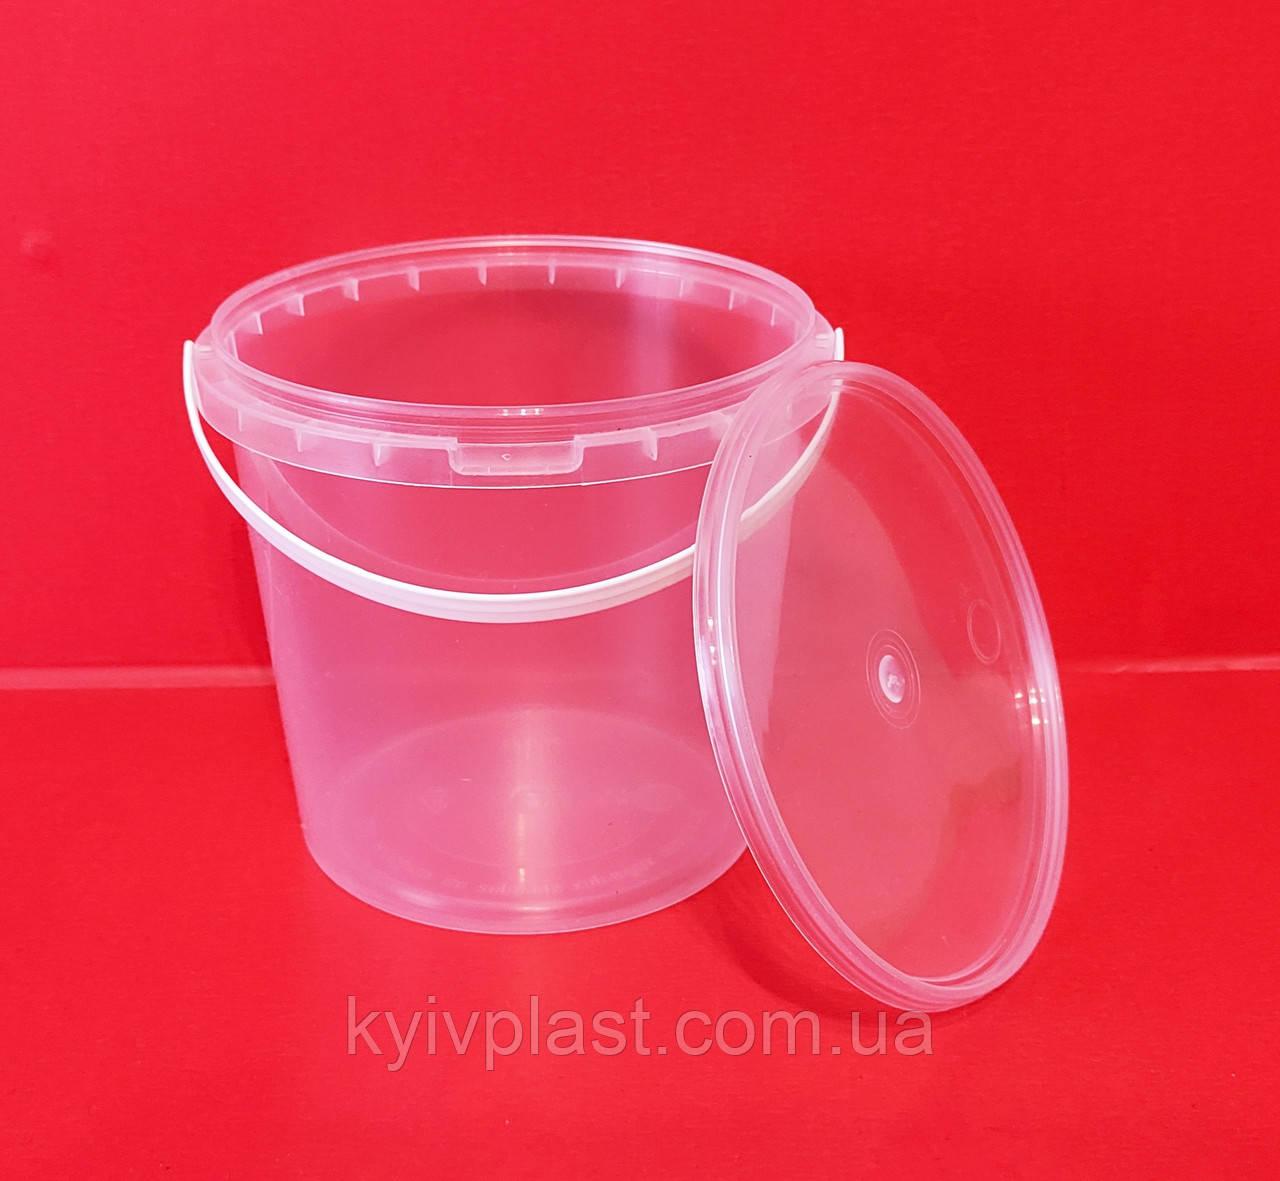 Ведро пластиковое пищевое 1 л СТ прозрачное